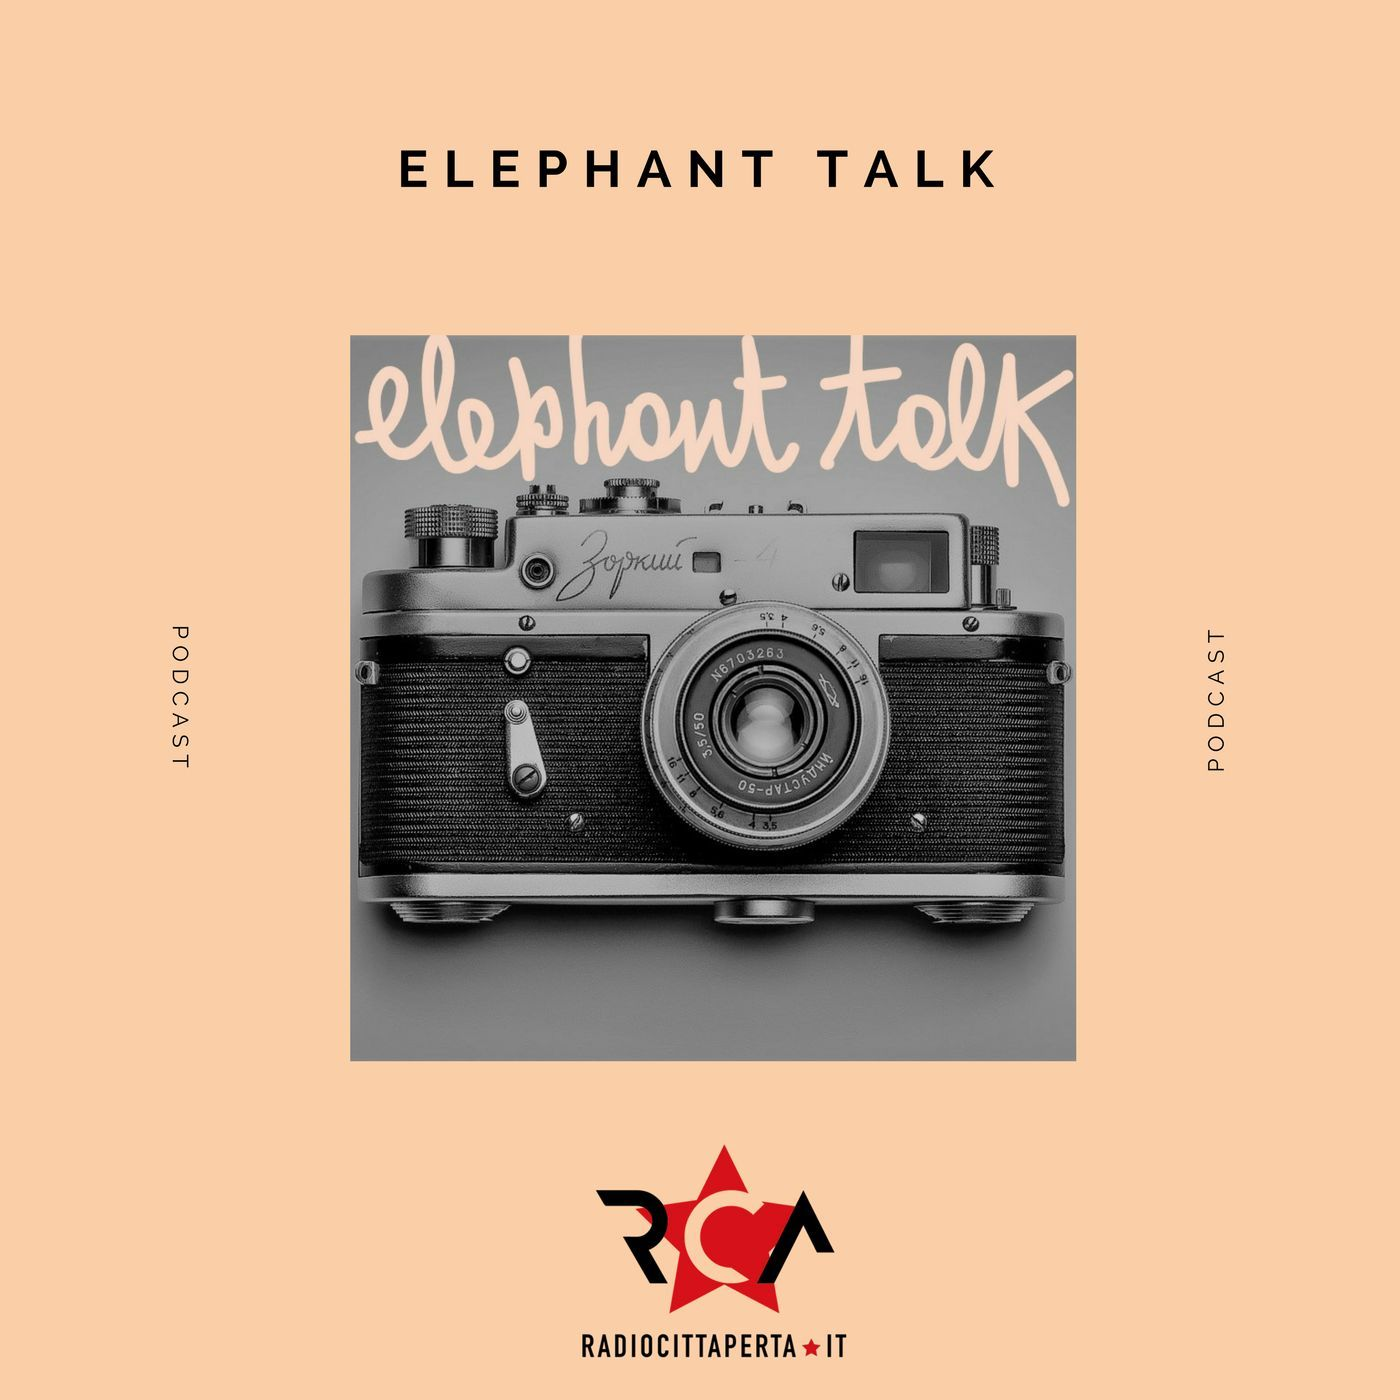 ELEPHANT TALK con FEDERICA del 06-12-2019